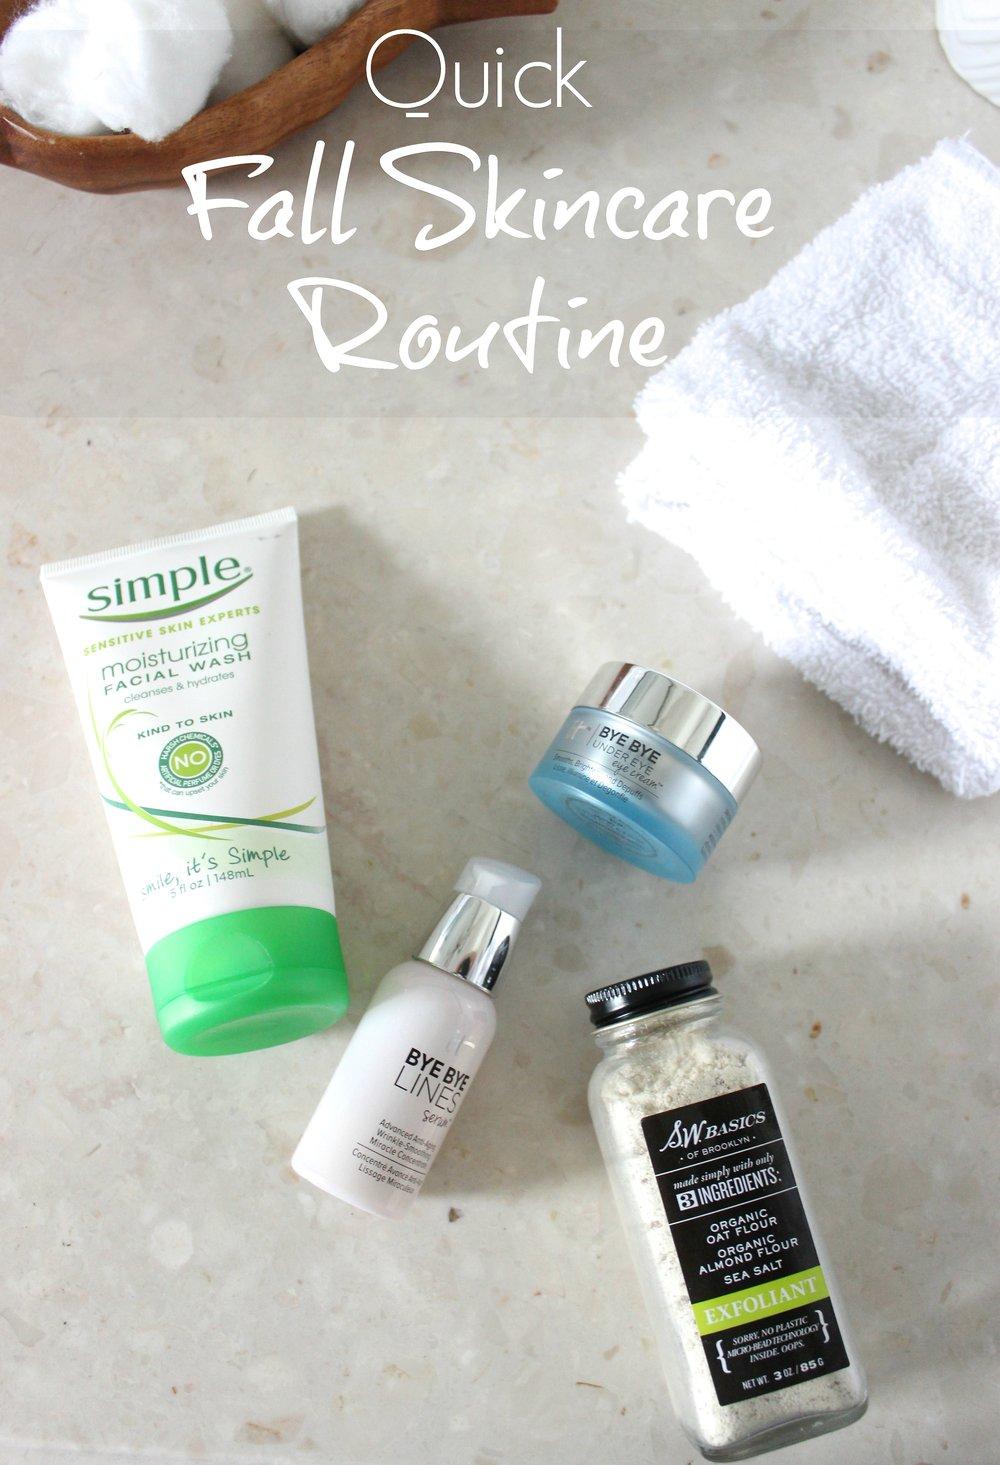 quick fall skincare routine